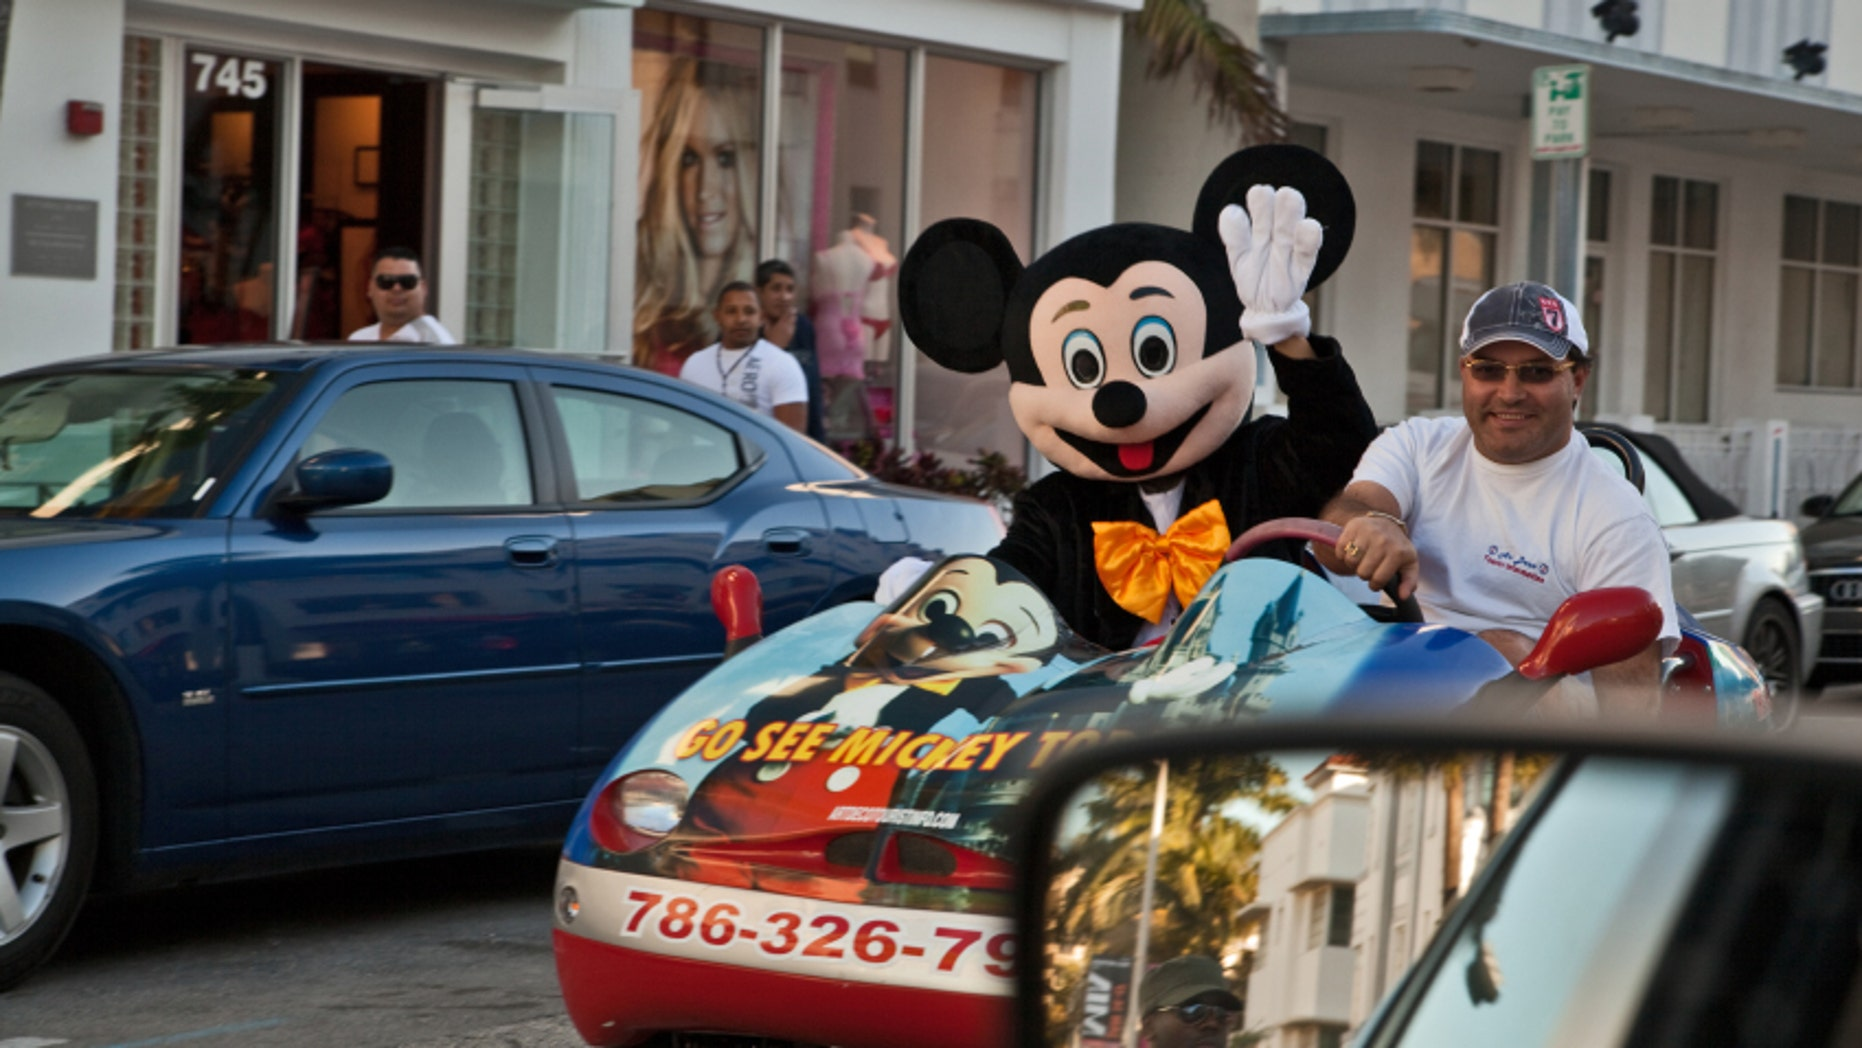 Disney World or Disneyland? You be the judge.